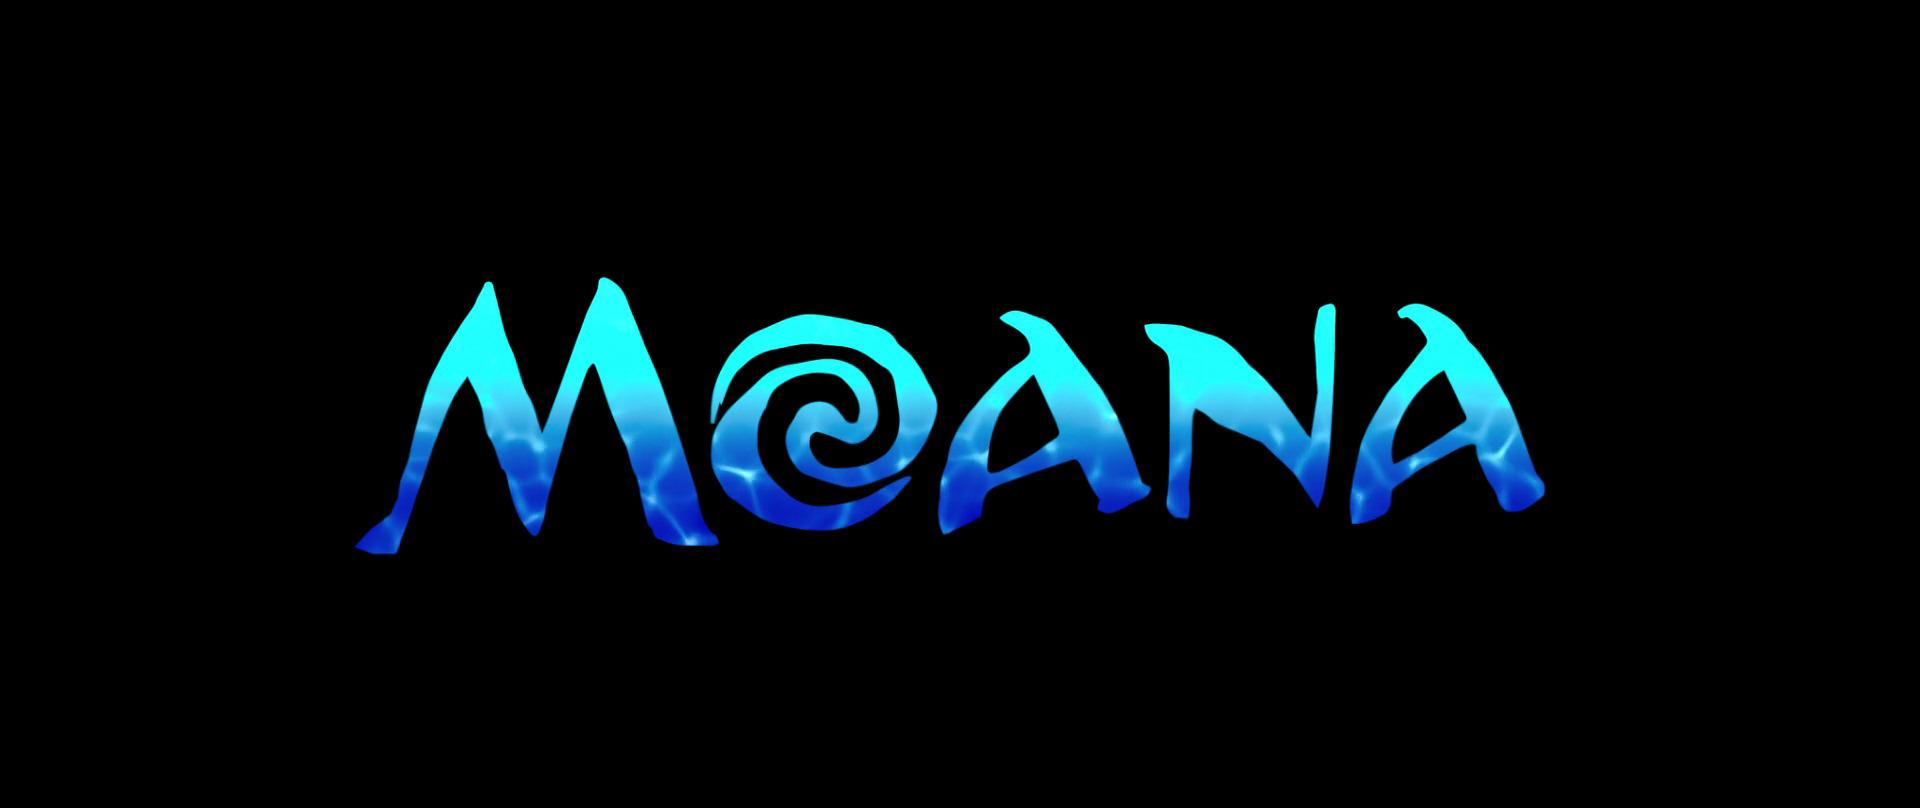 Animation Screencapscom Page 4 Screencapsus